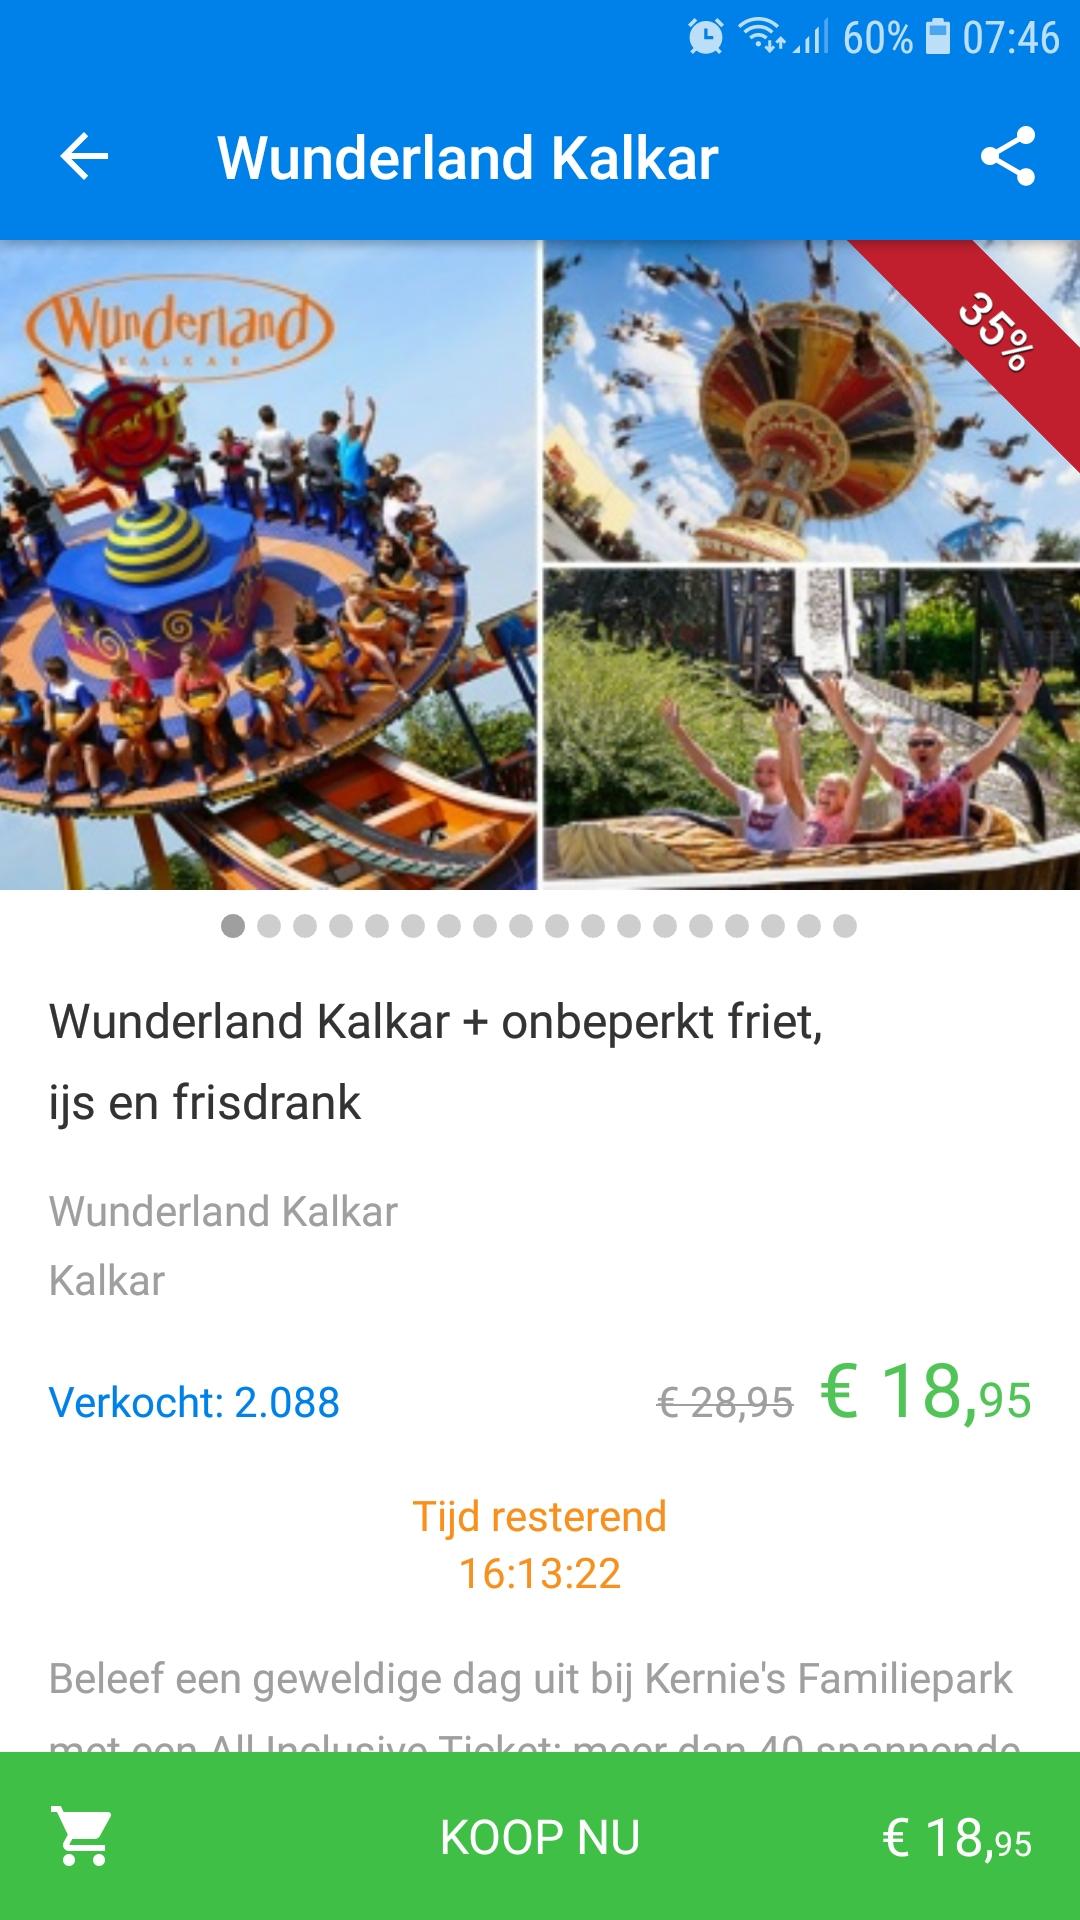 Wunderland kalkar voor €18.95 pp ipv 28.95